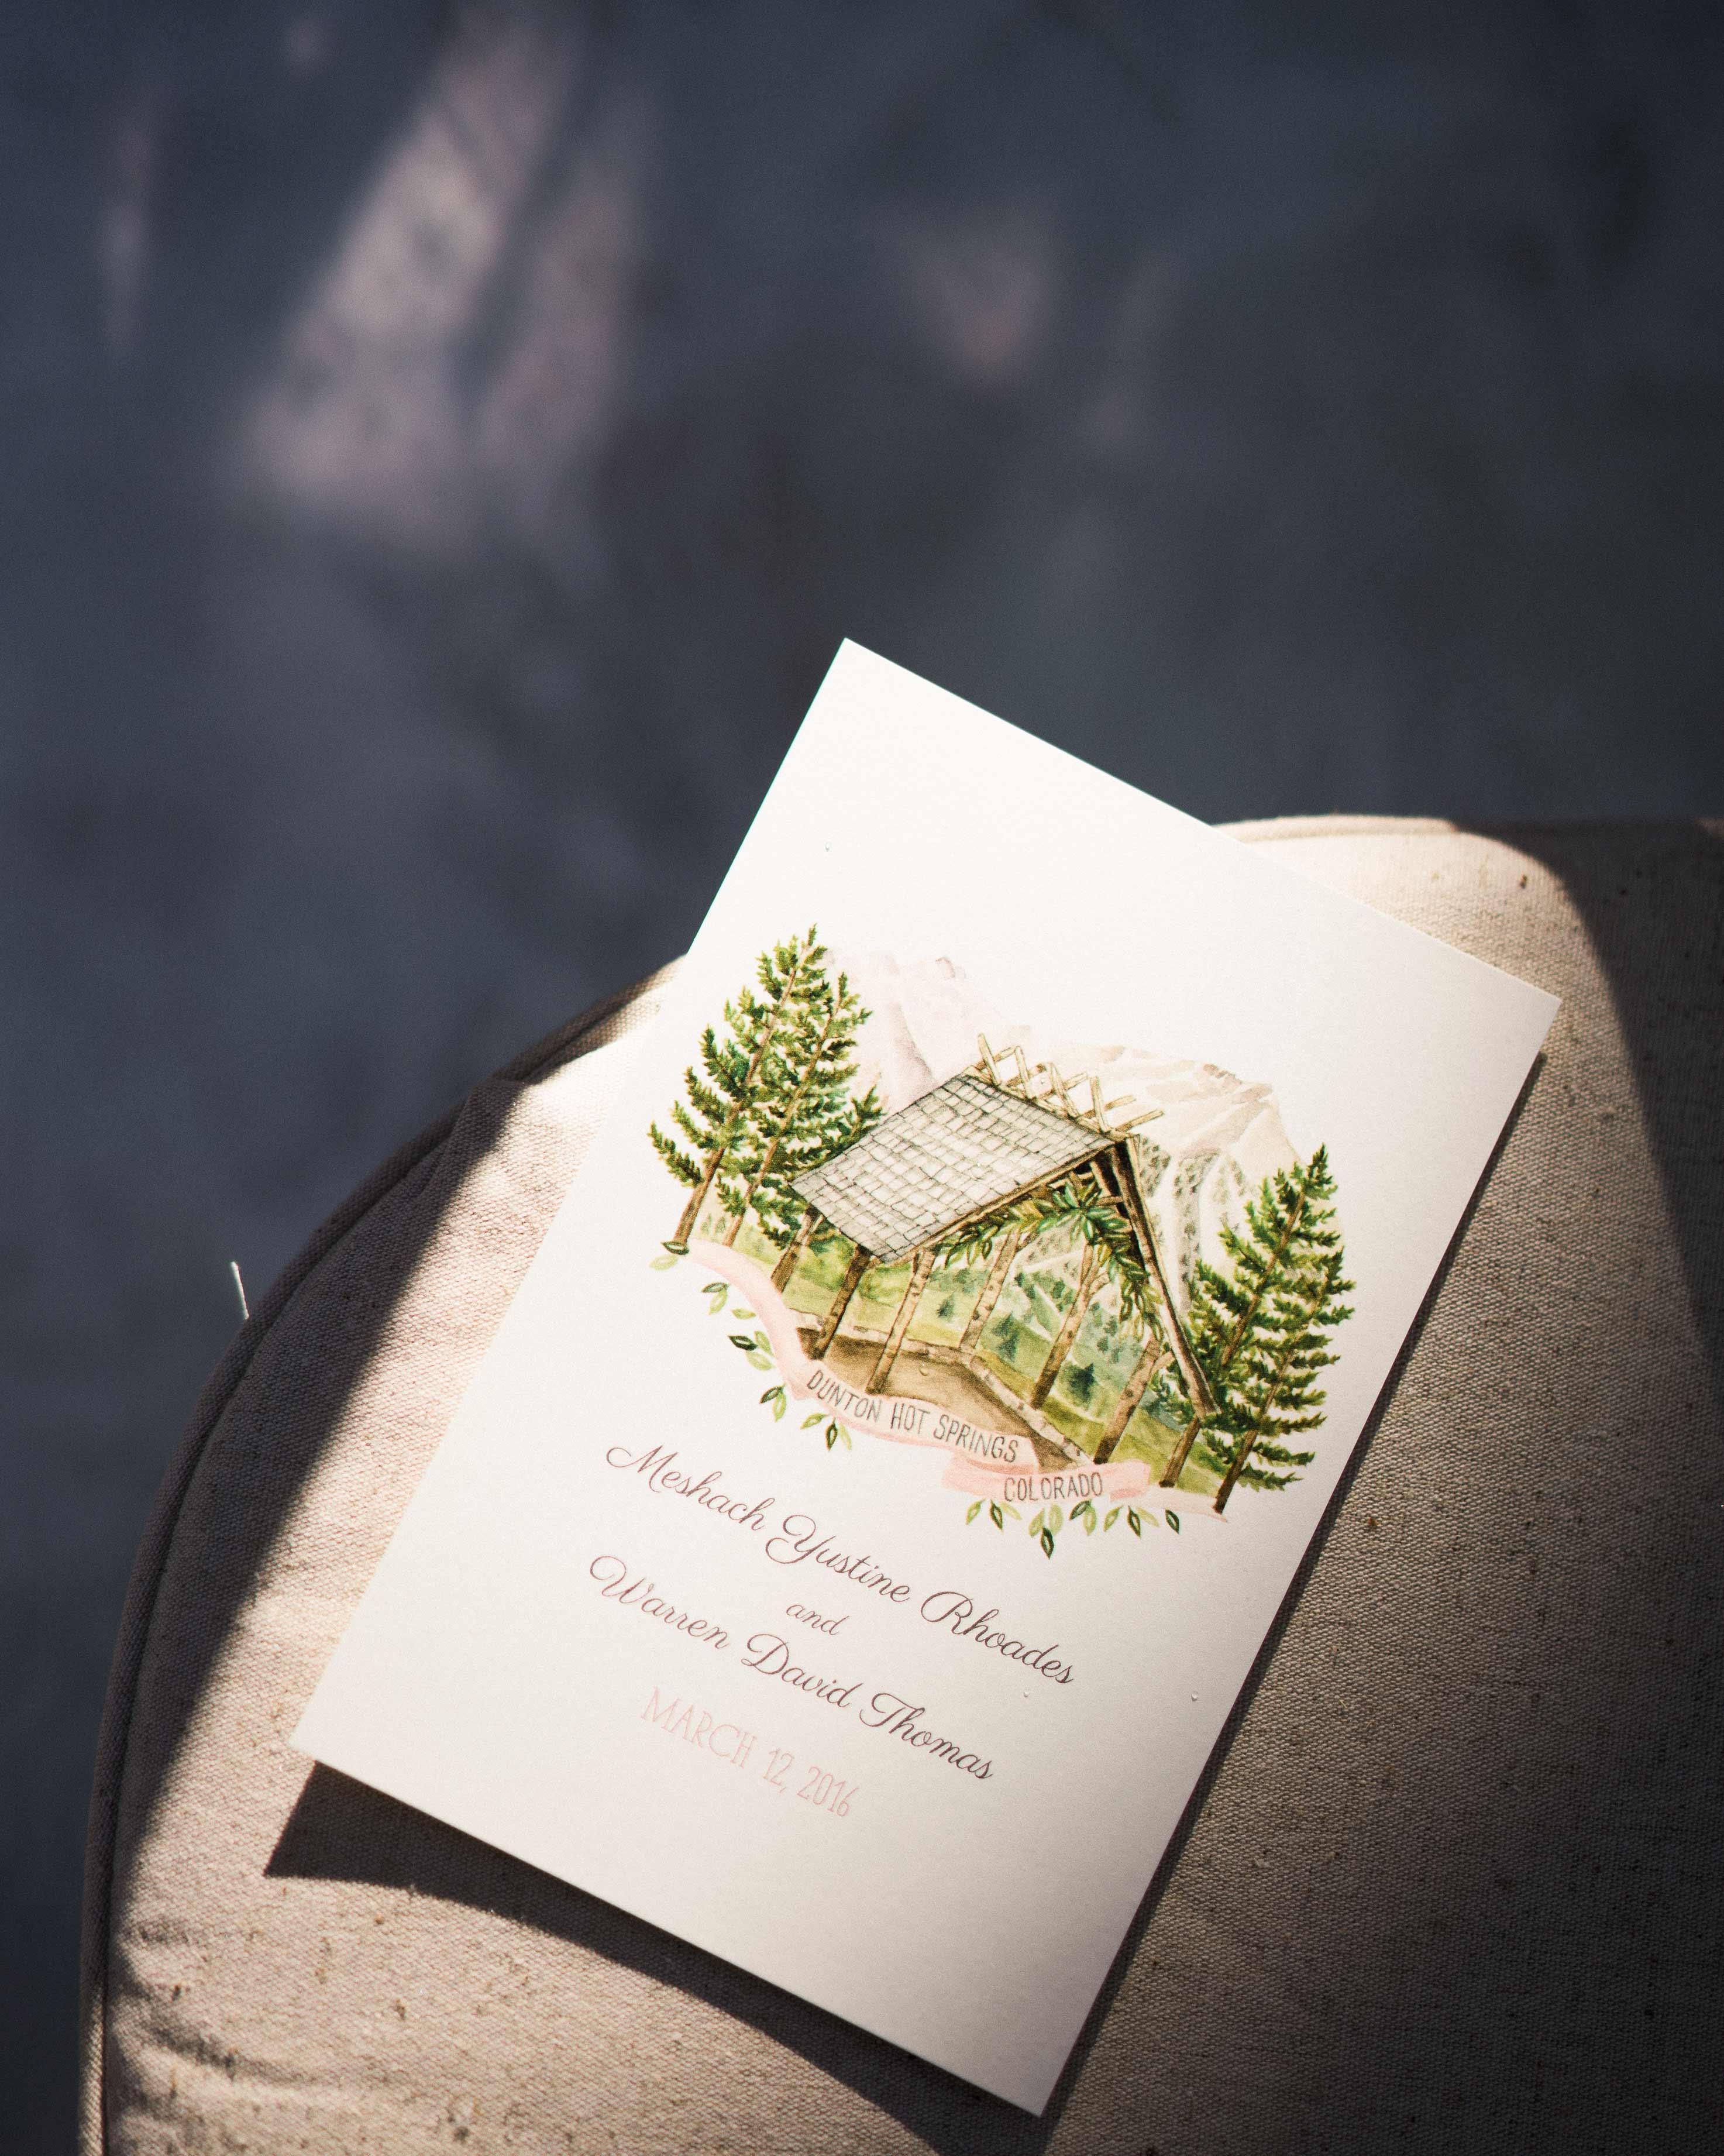 meshach-warren-wedding-program-0405-6134942-0716.jpg